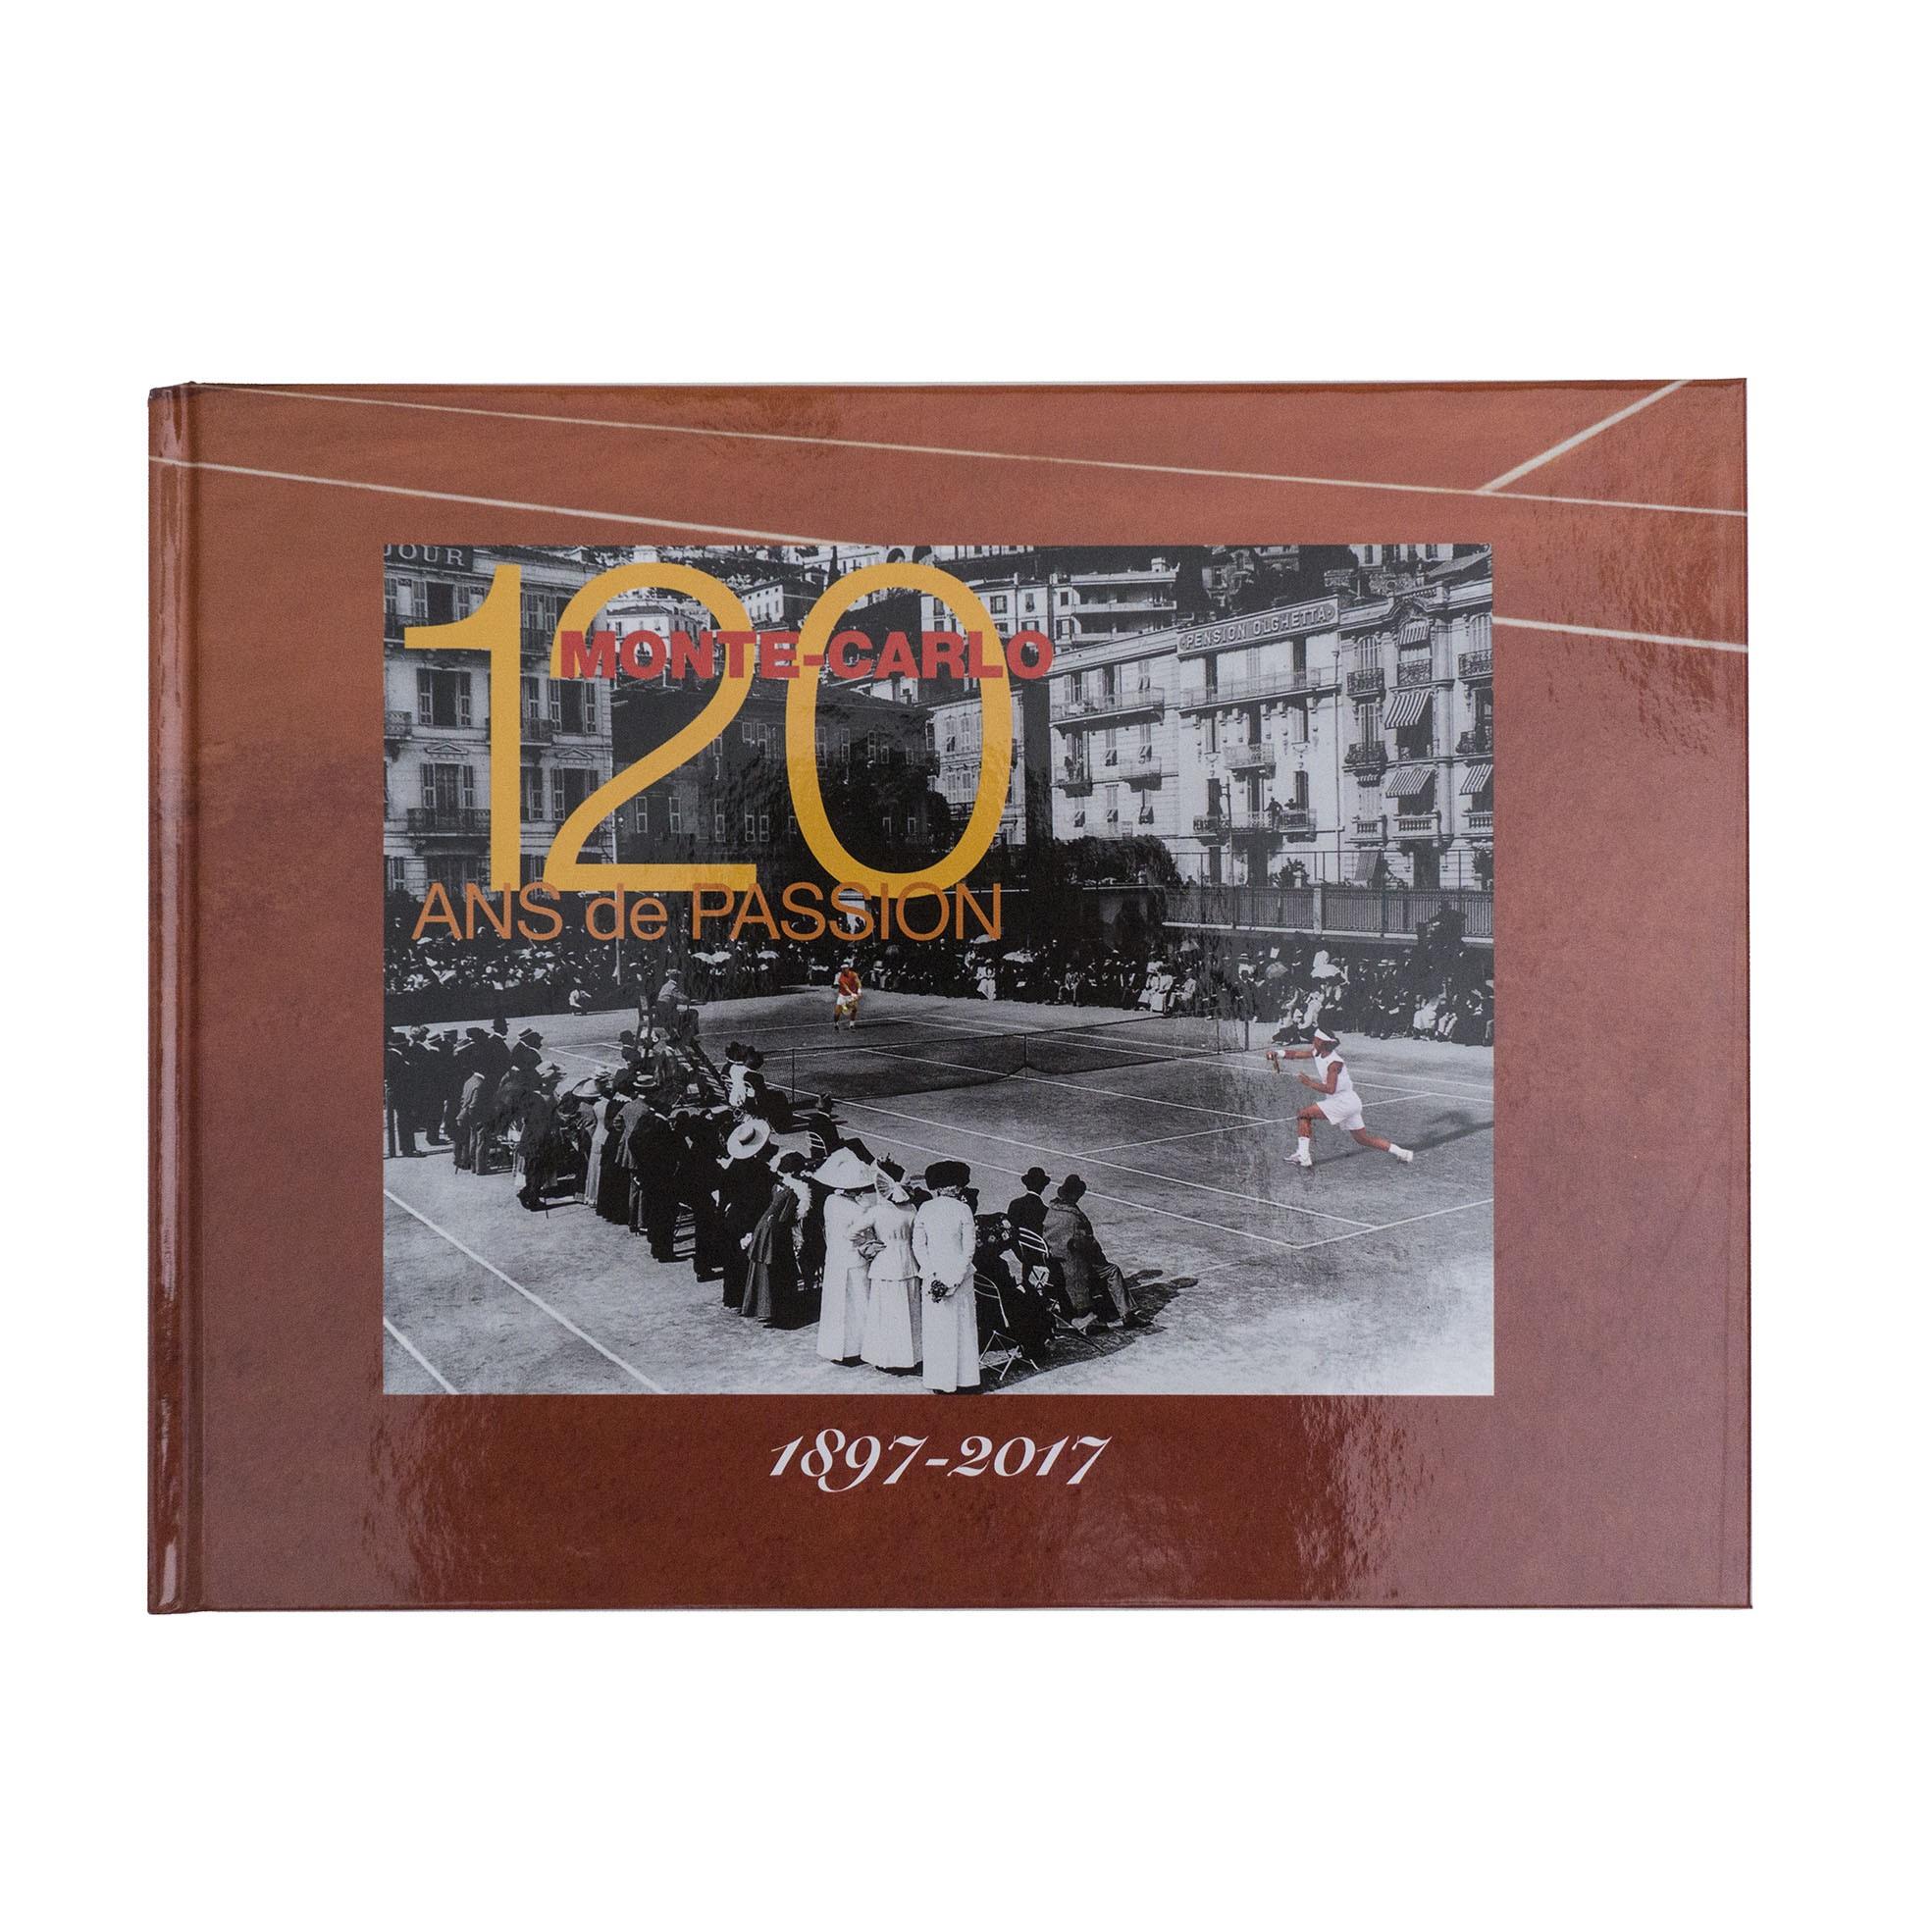 BOOK 120 YEARS